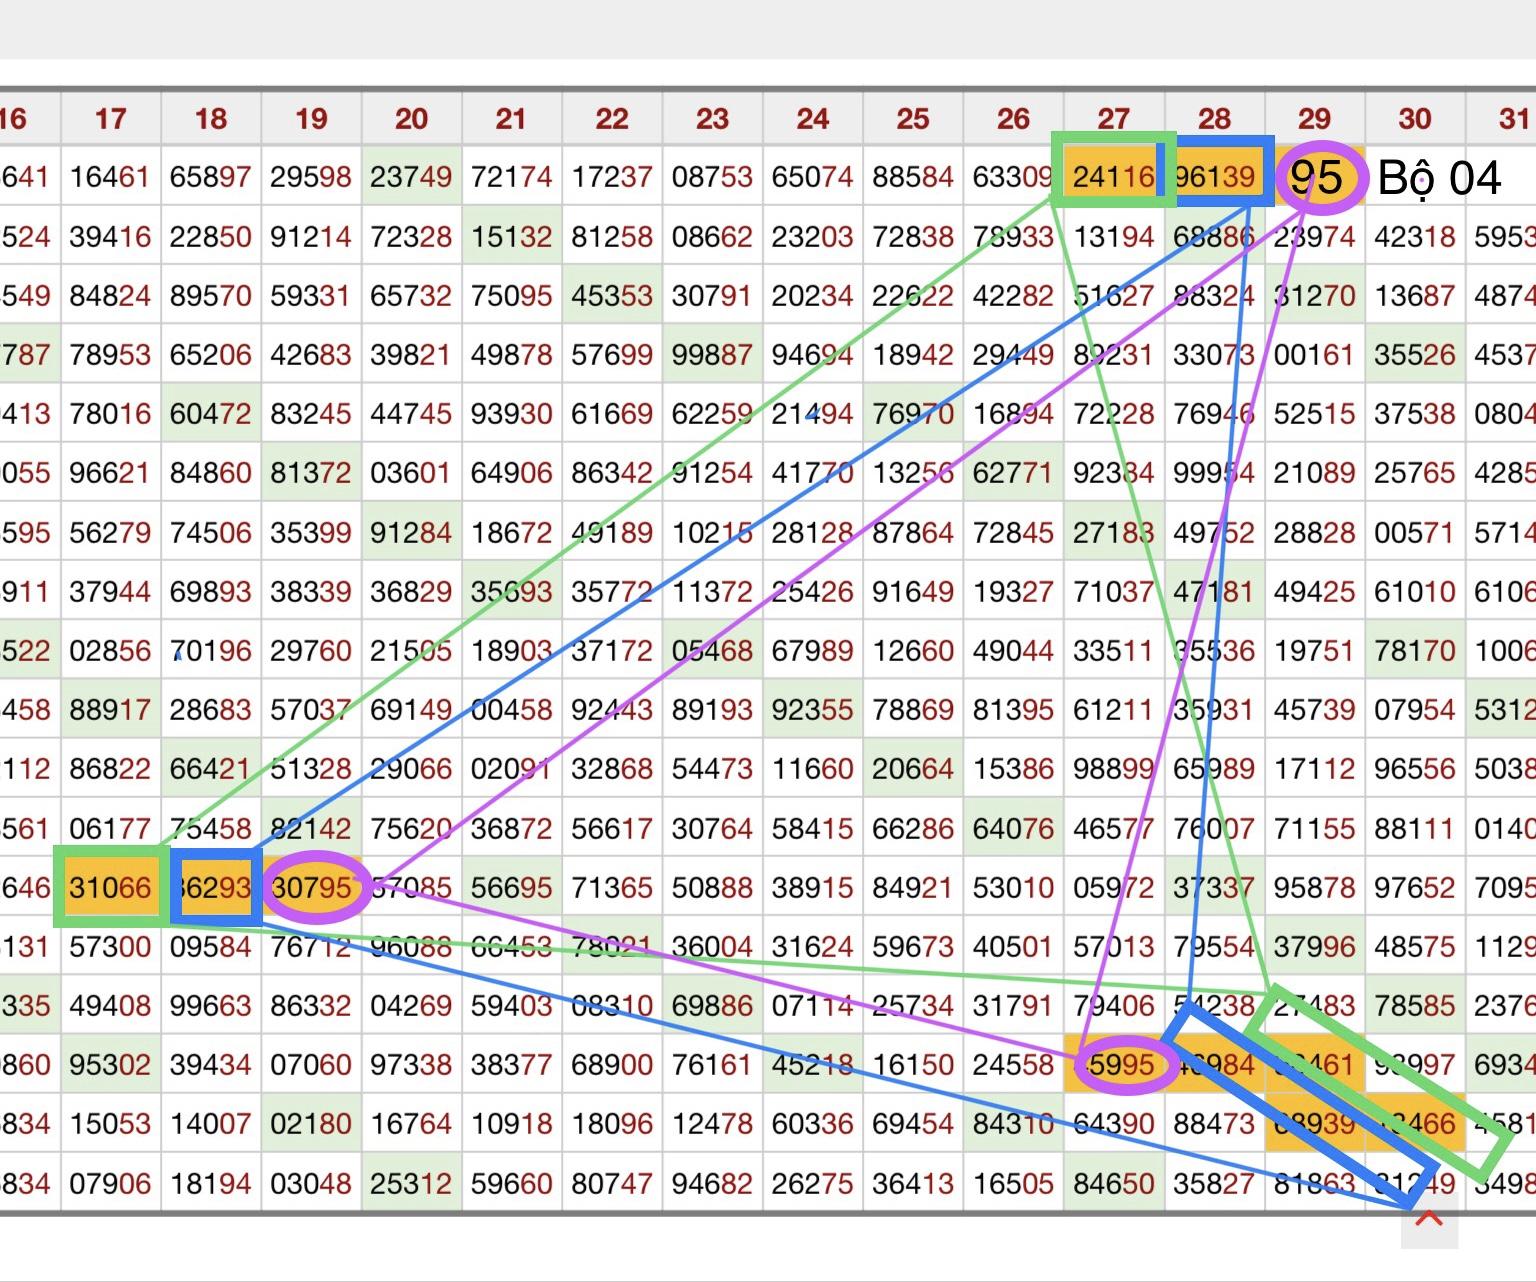 BFFE6D13-9A34-4B33-84C5-29BBF40E0911.jpeg